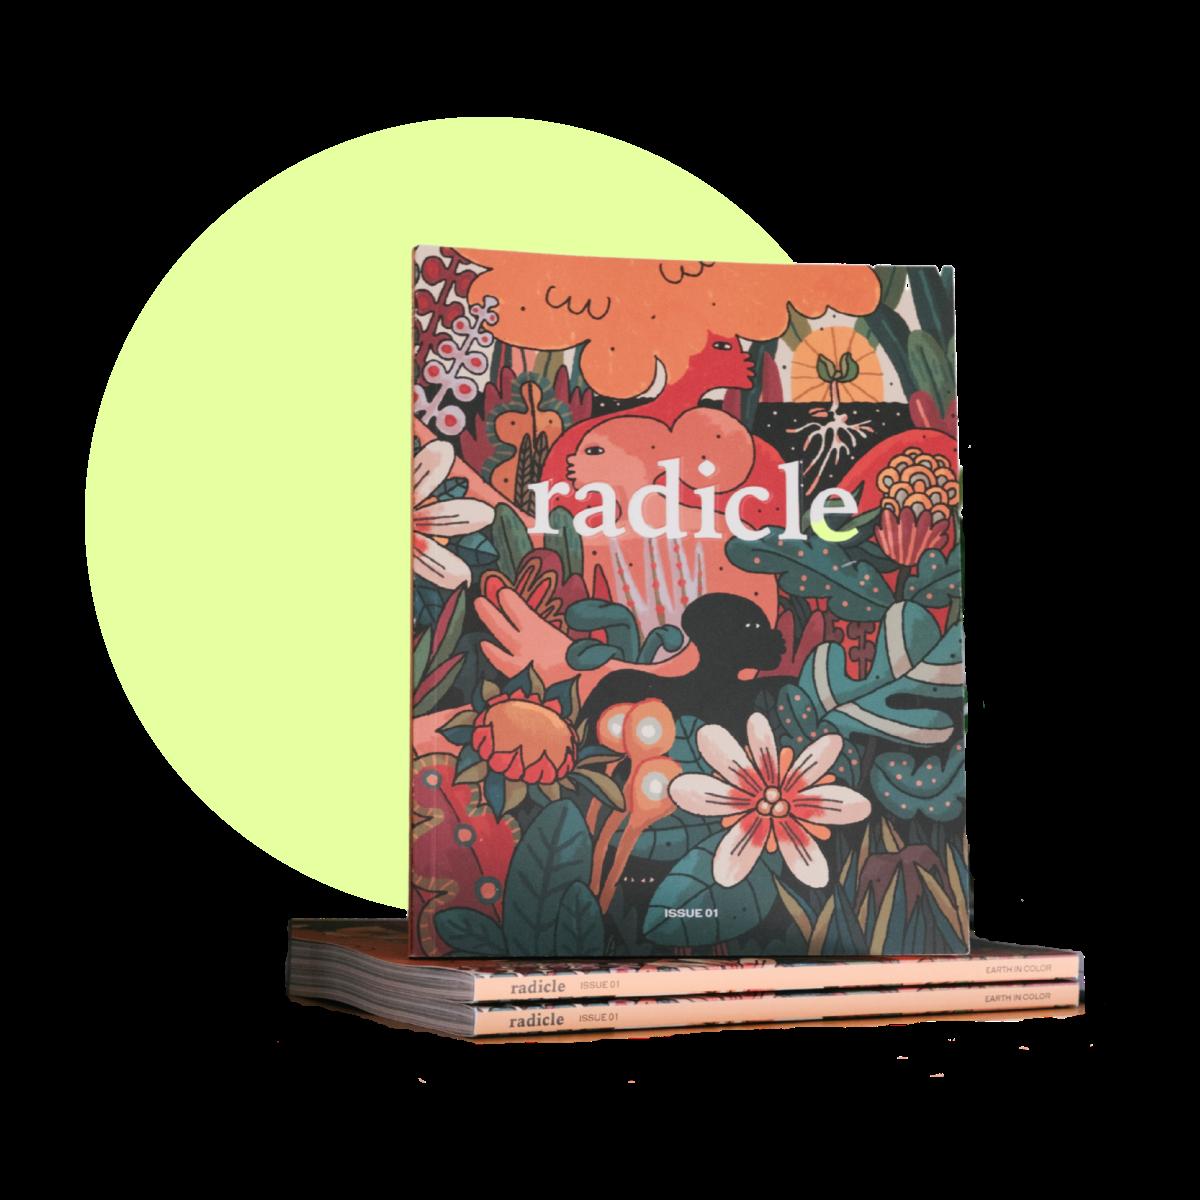 Radicle Magazine cover